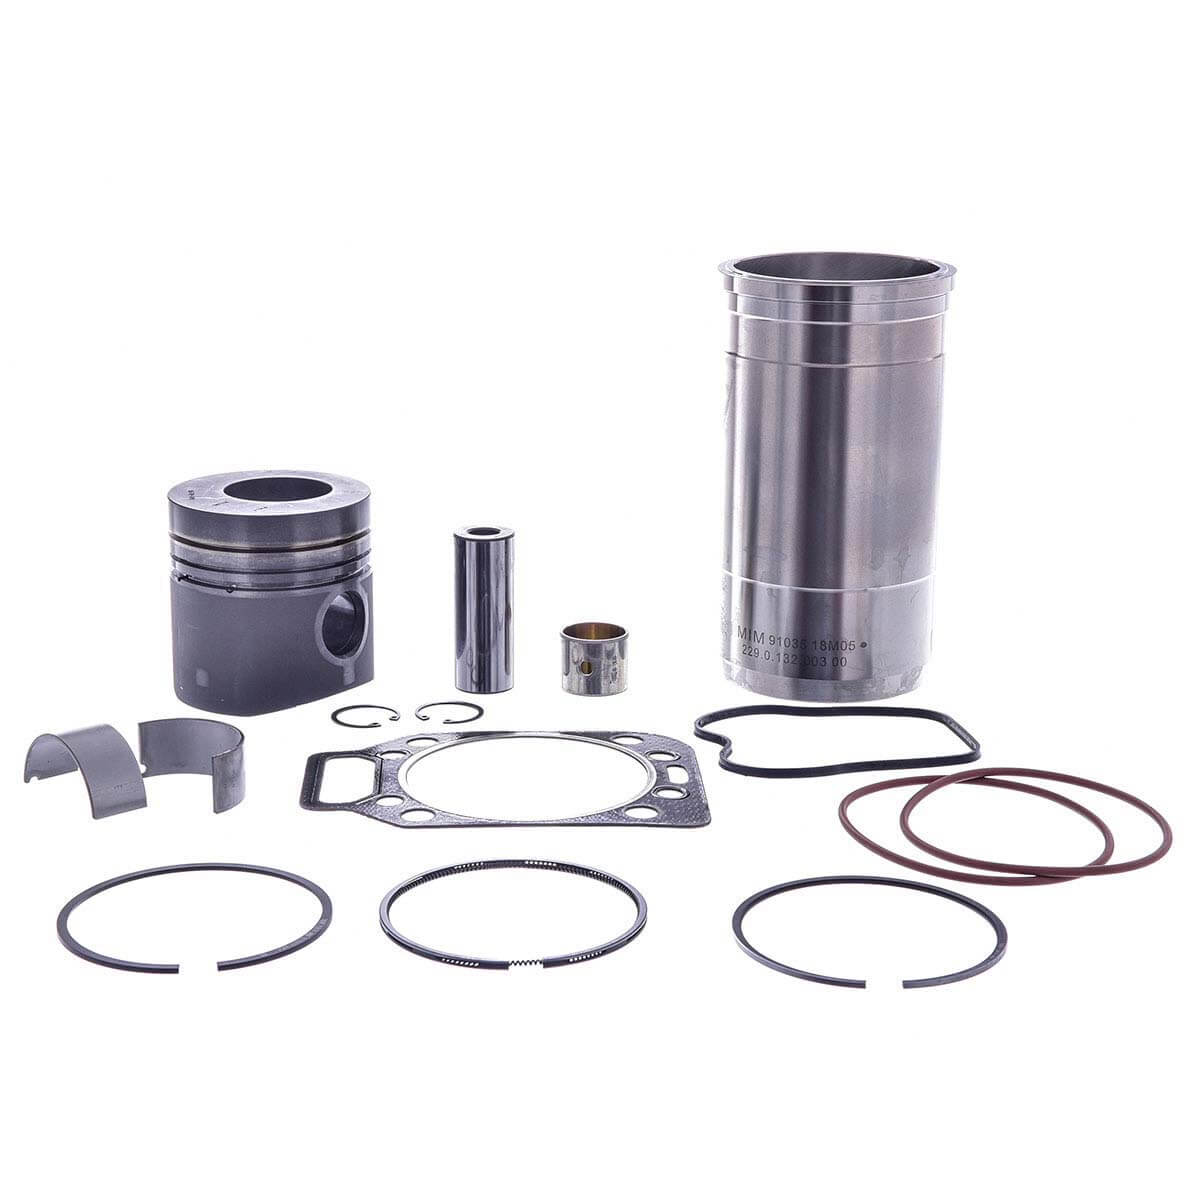 Kit Motor MWM 229 Todos F1000 7110s 0.25 C/ Bronzina